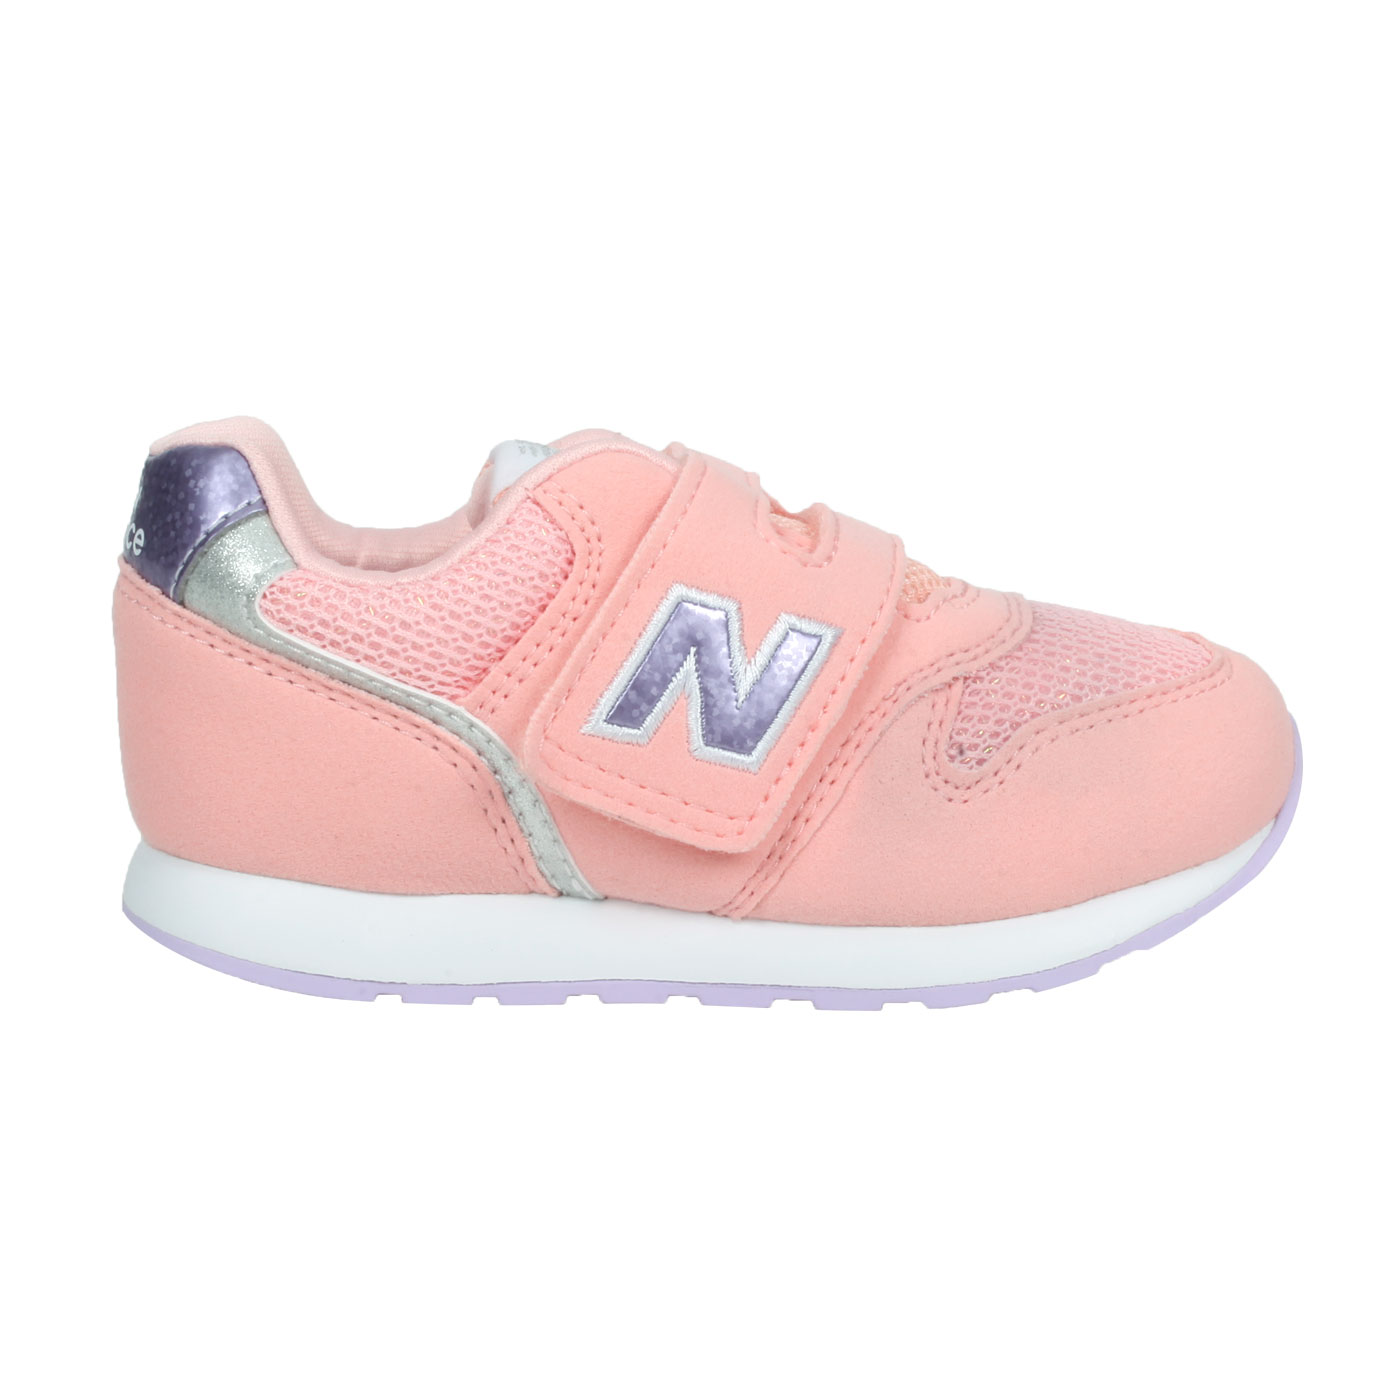 NEW BALANCE 小童休閒運動鞋-WIDE IZ996UPN